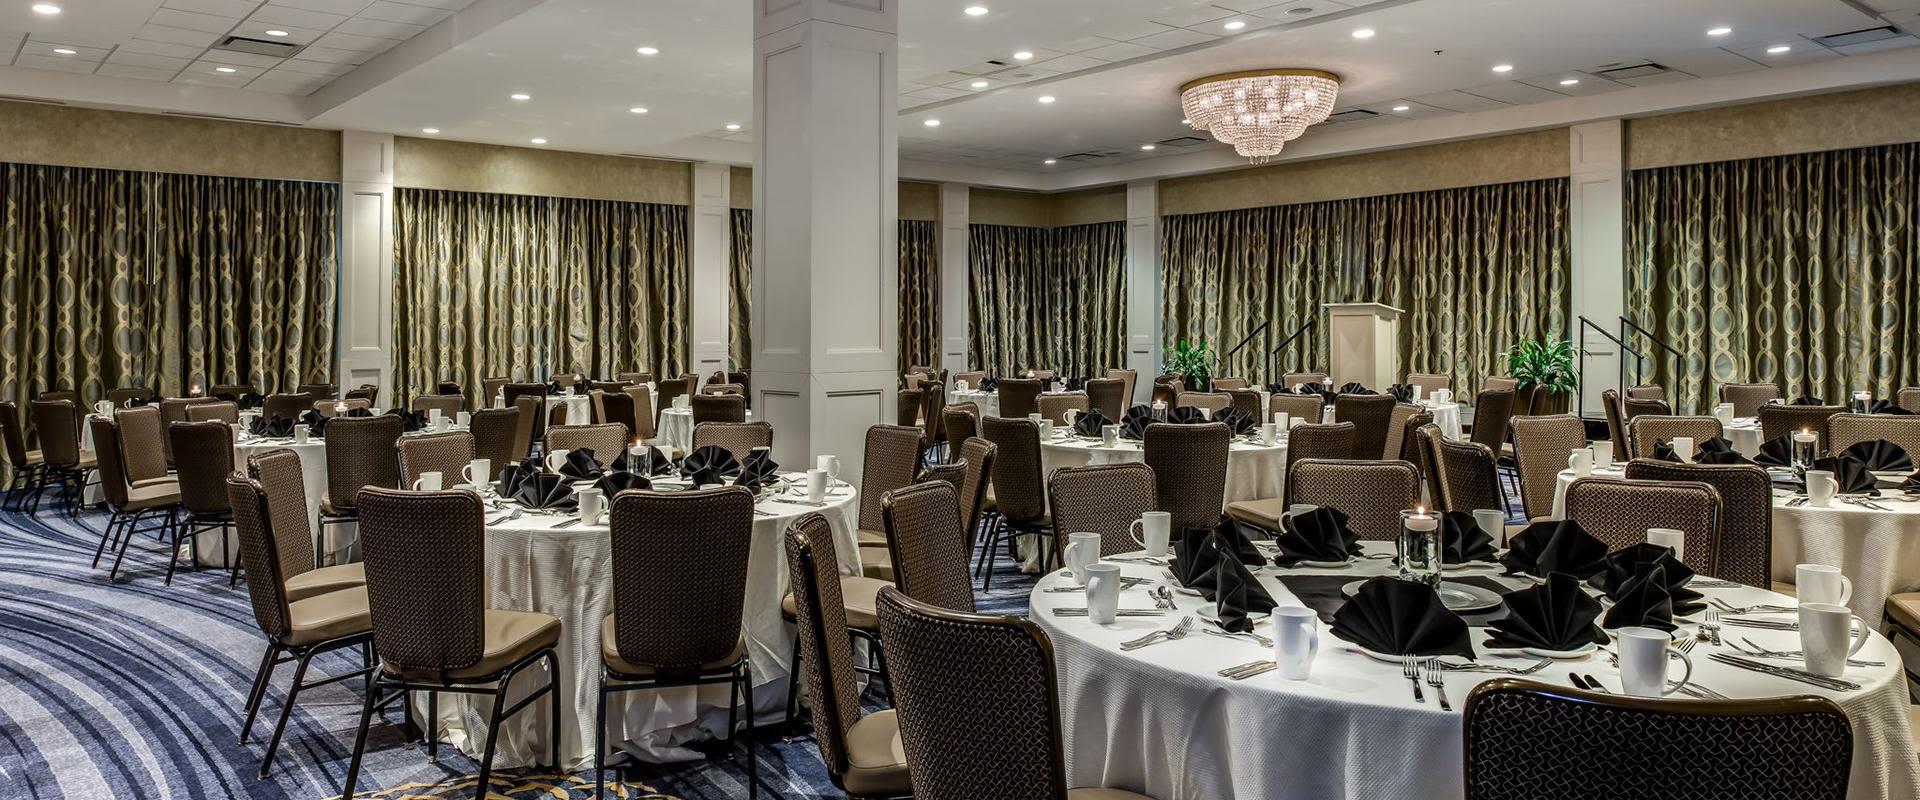 Charlotte Hotel Ballroom Round Tables